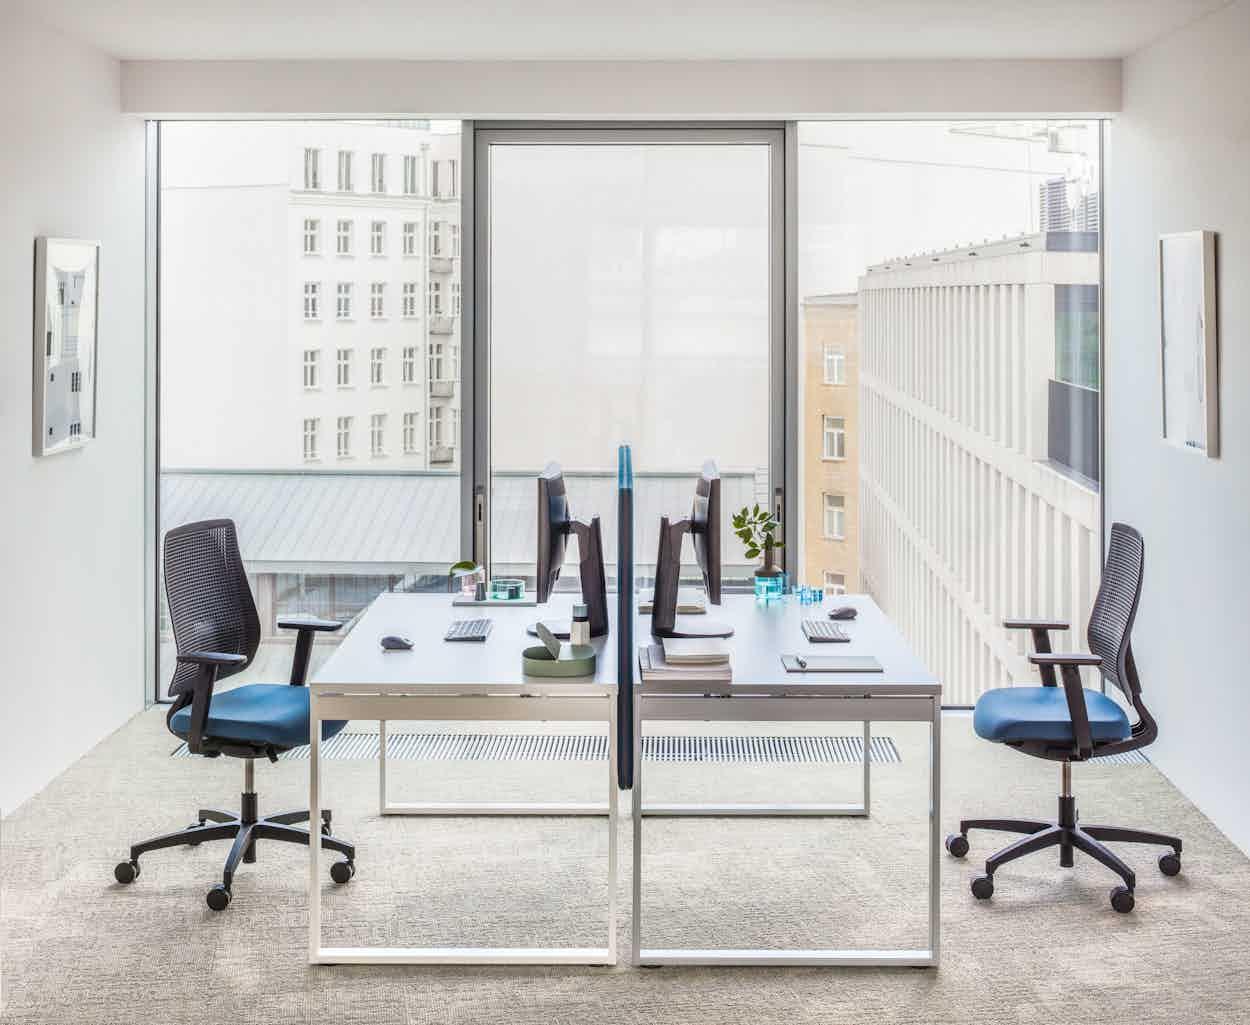 Mdd furniture ayla chair insitu duohaute living